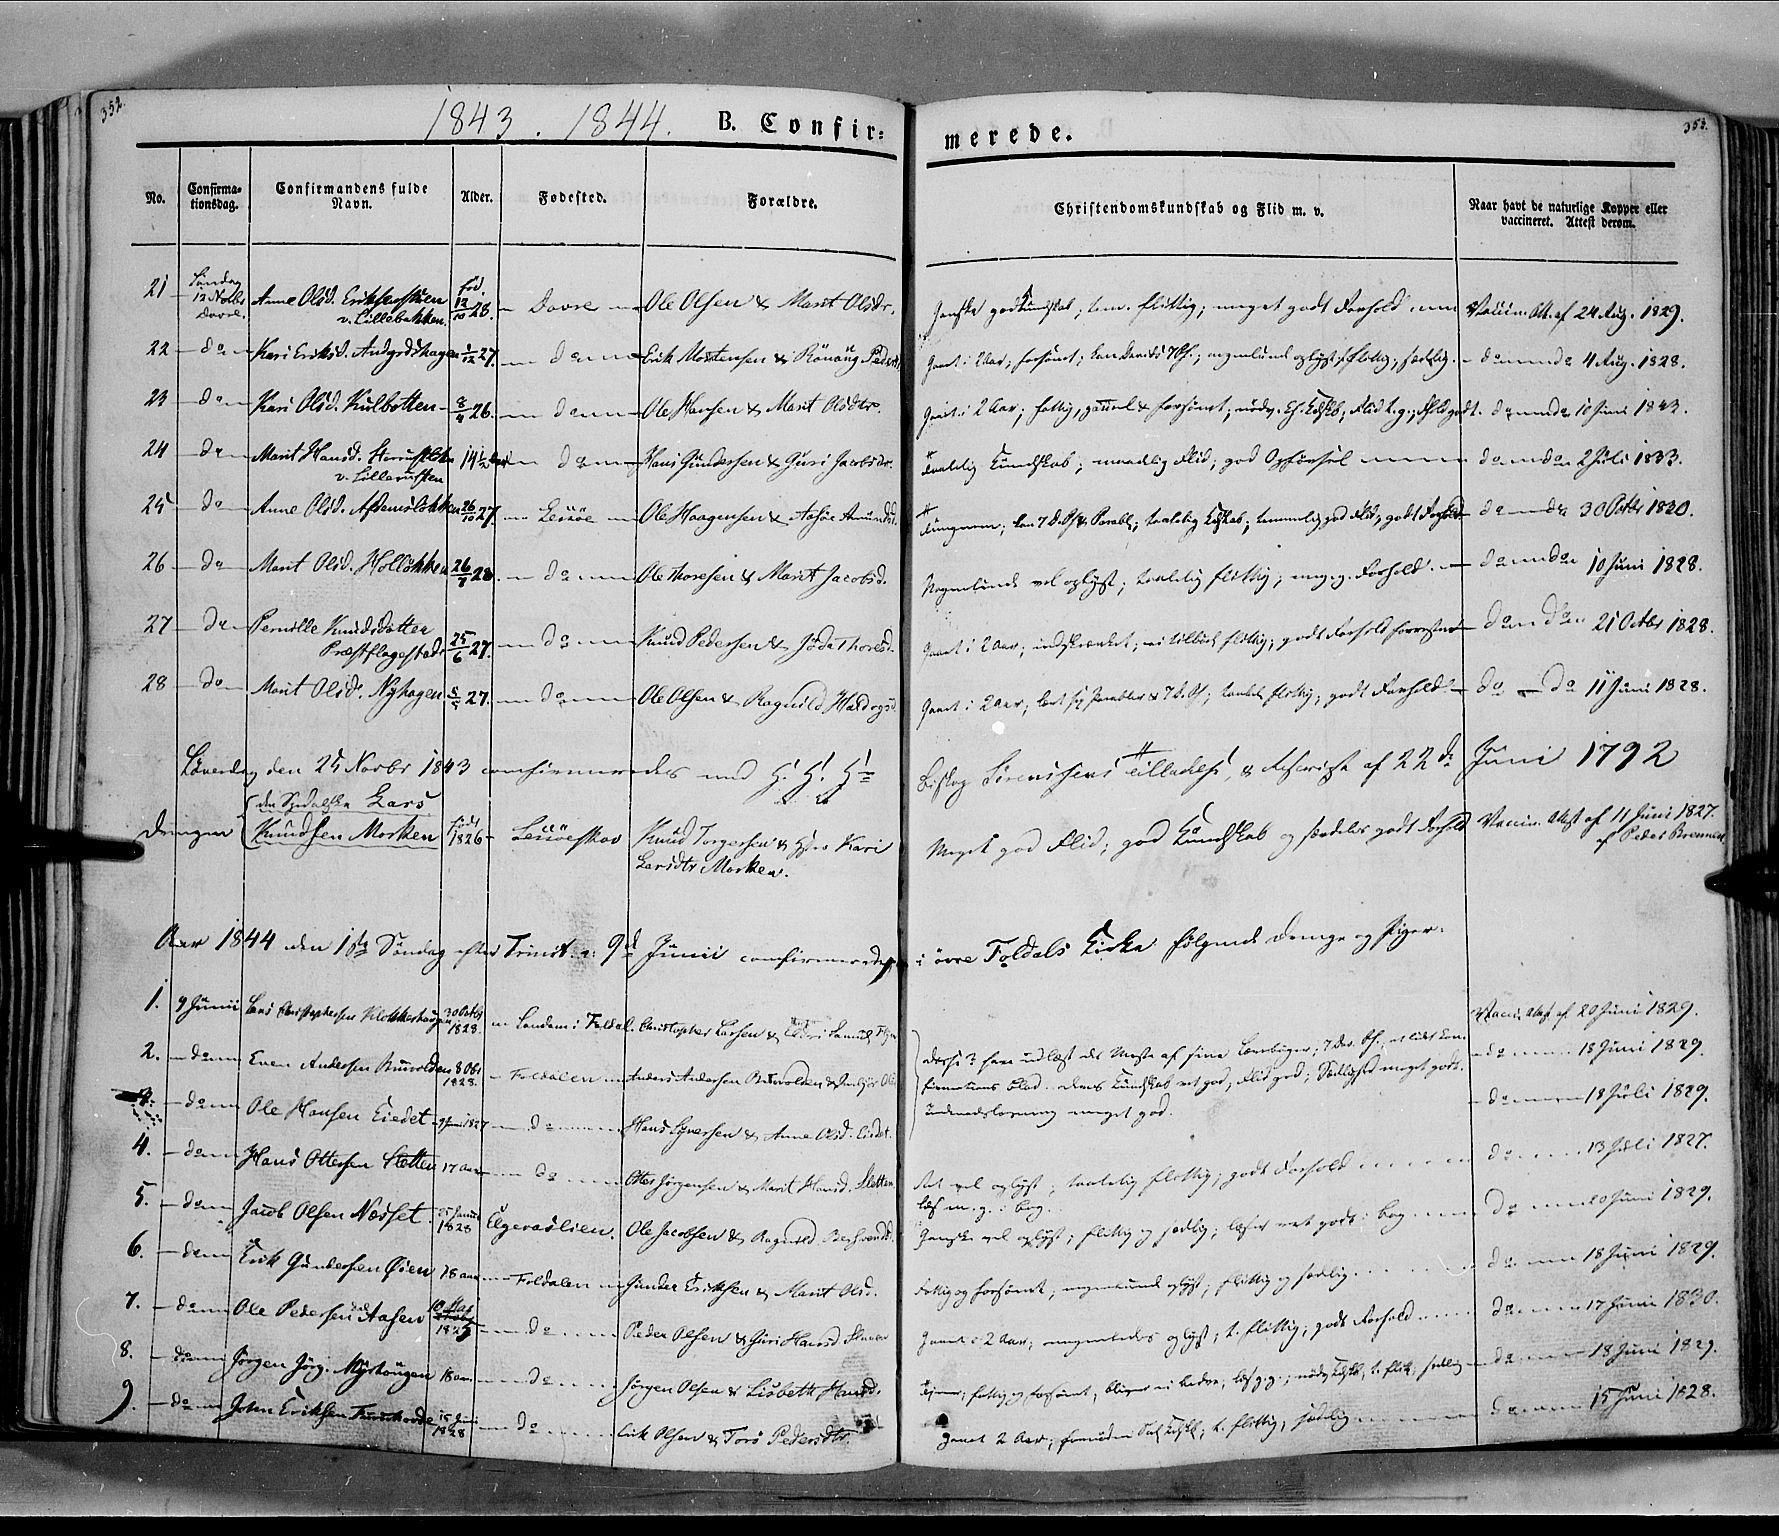 SAH, Lesja prestekontor, Ministerialbok nr. 6A, 1843-1854, s. 352-353